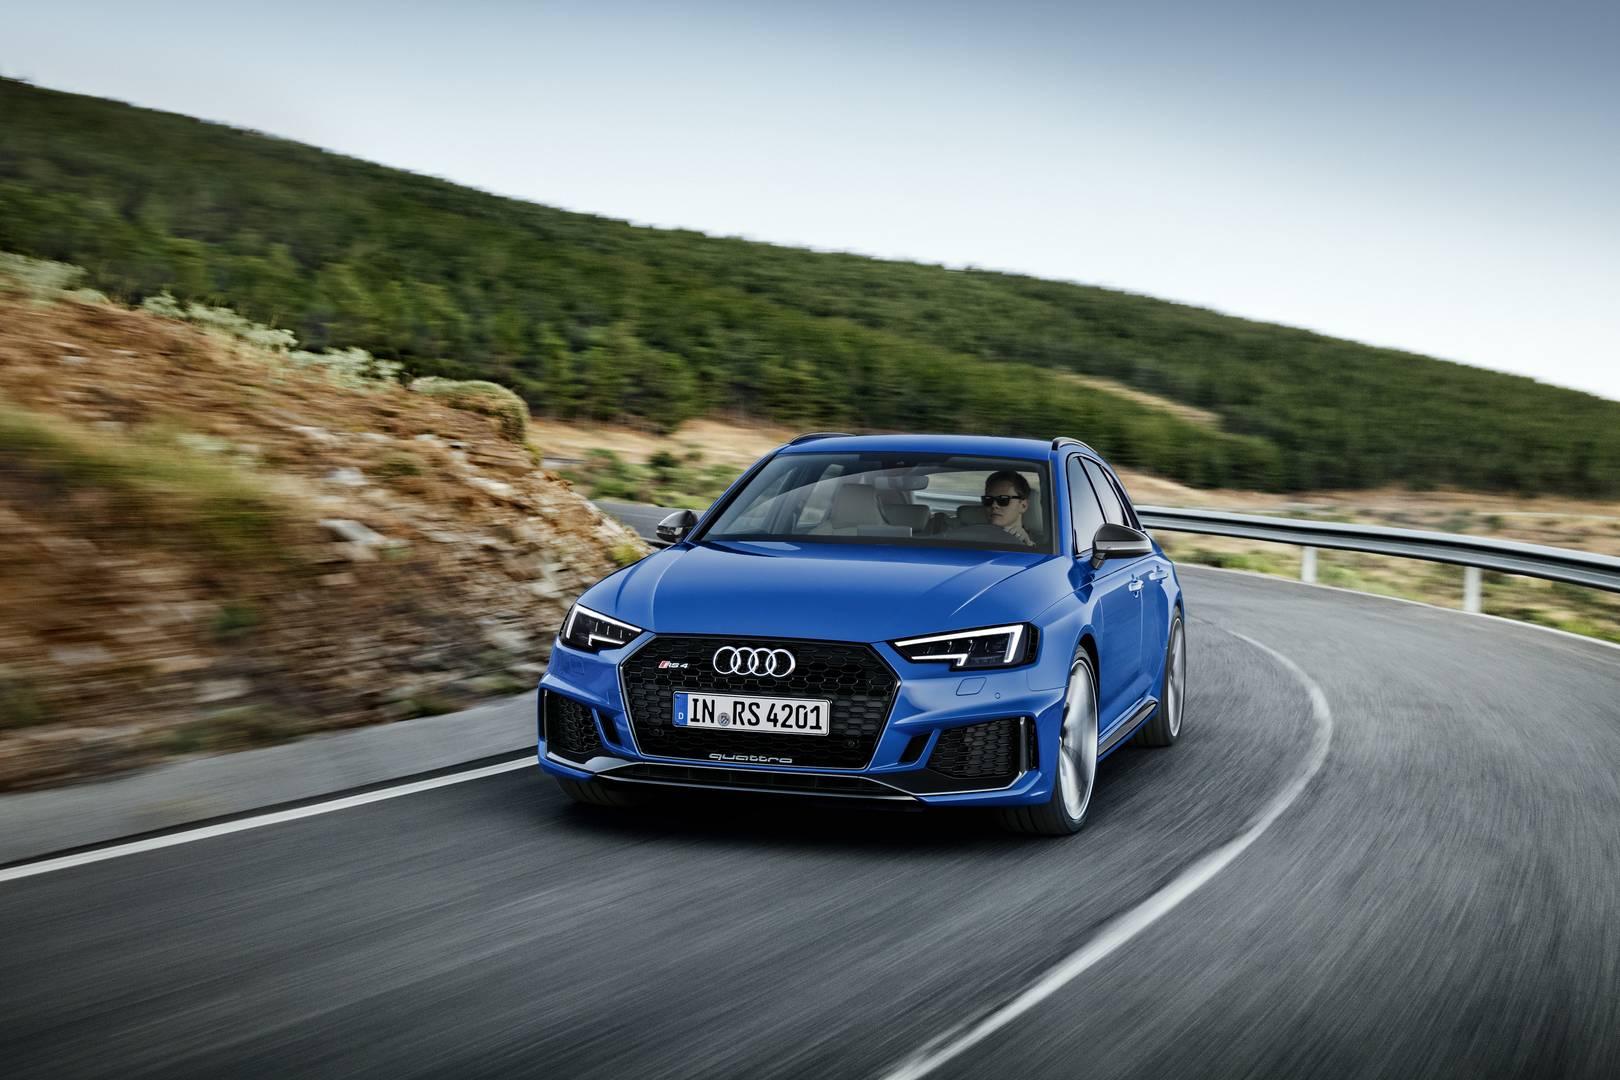 Official Audi RS Avant GTspirit - Audi rs4